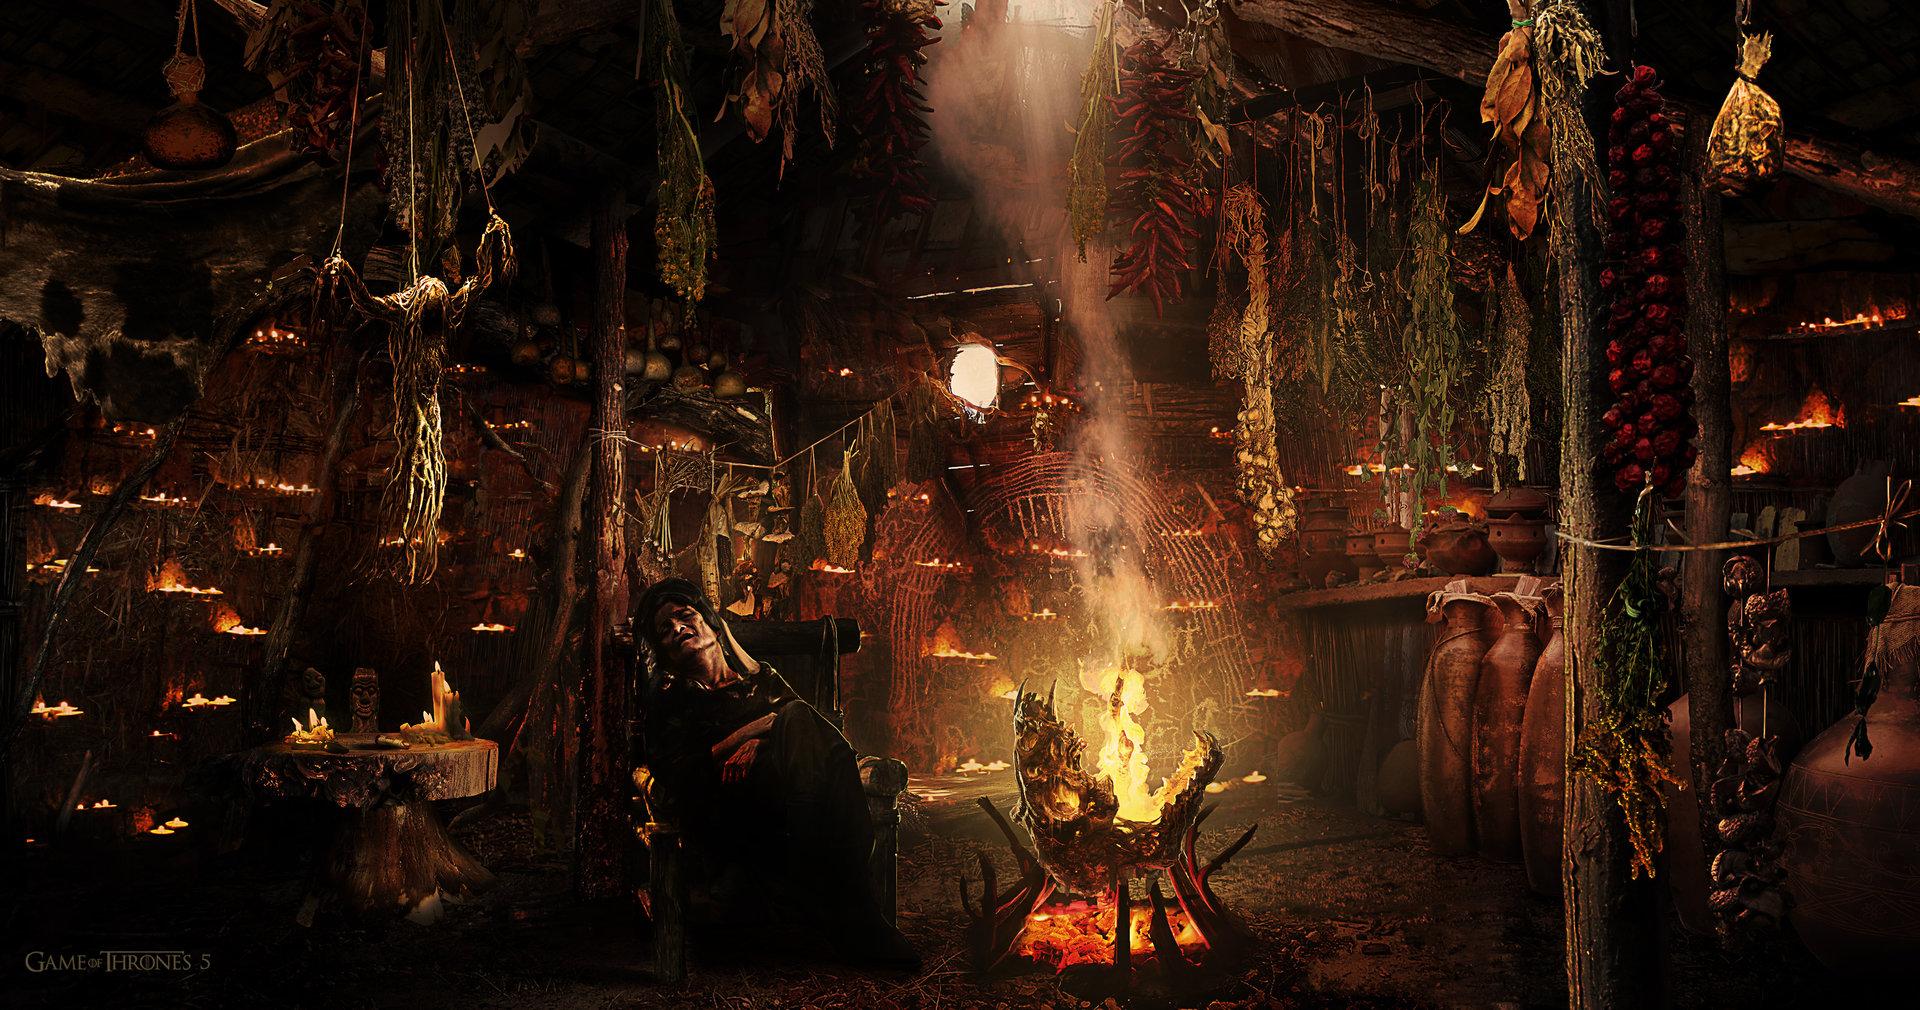 Kieran belshaw maggys hut interior v004bweb